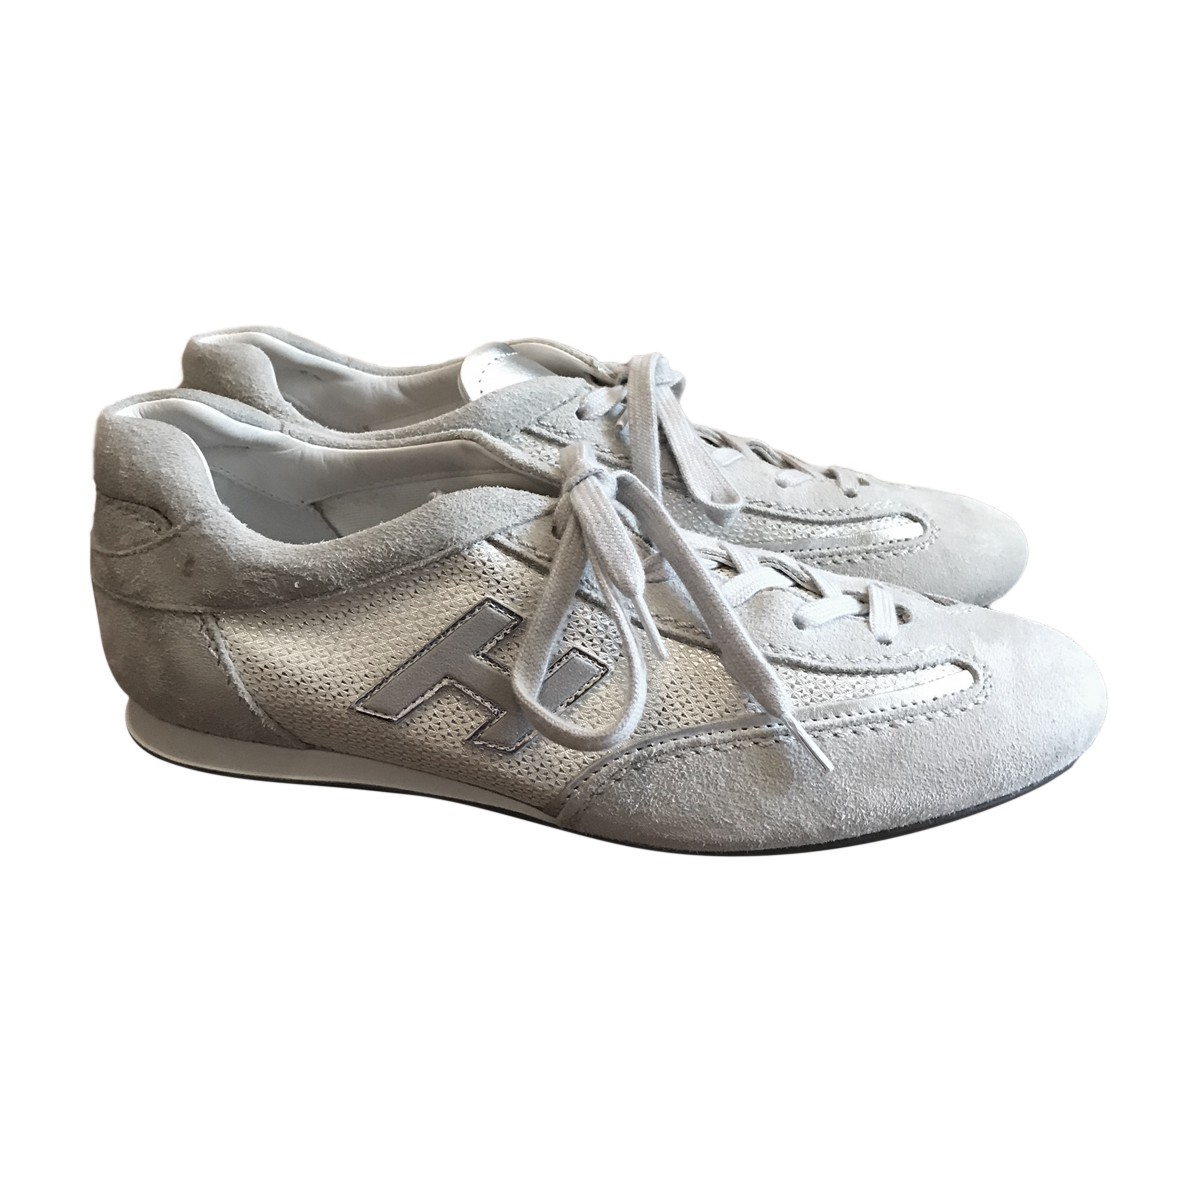 Hogan light grey trainers  87ae1deefd2